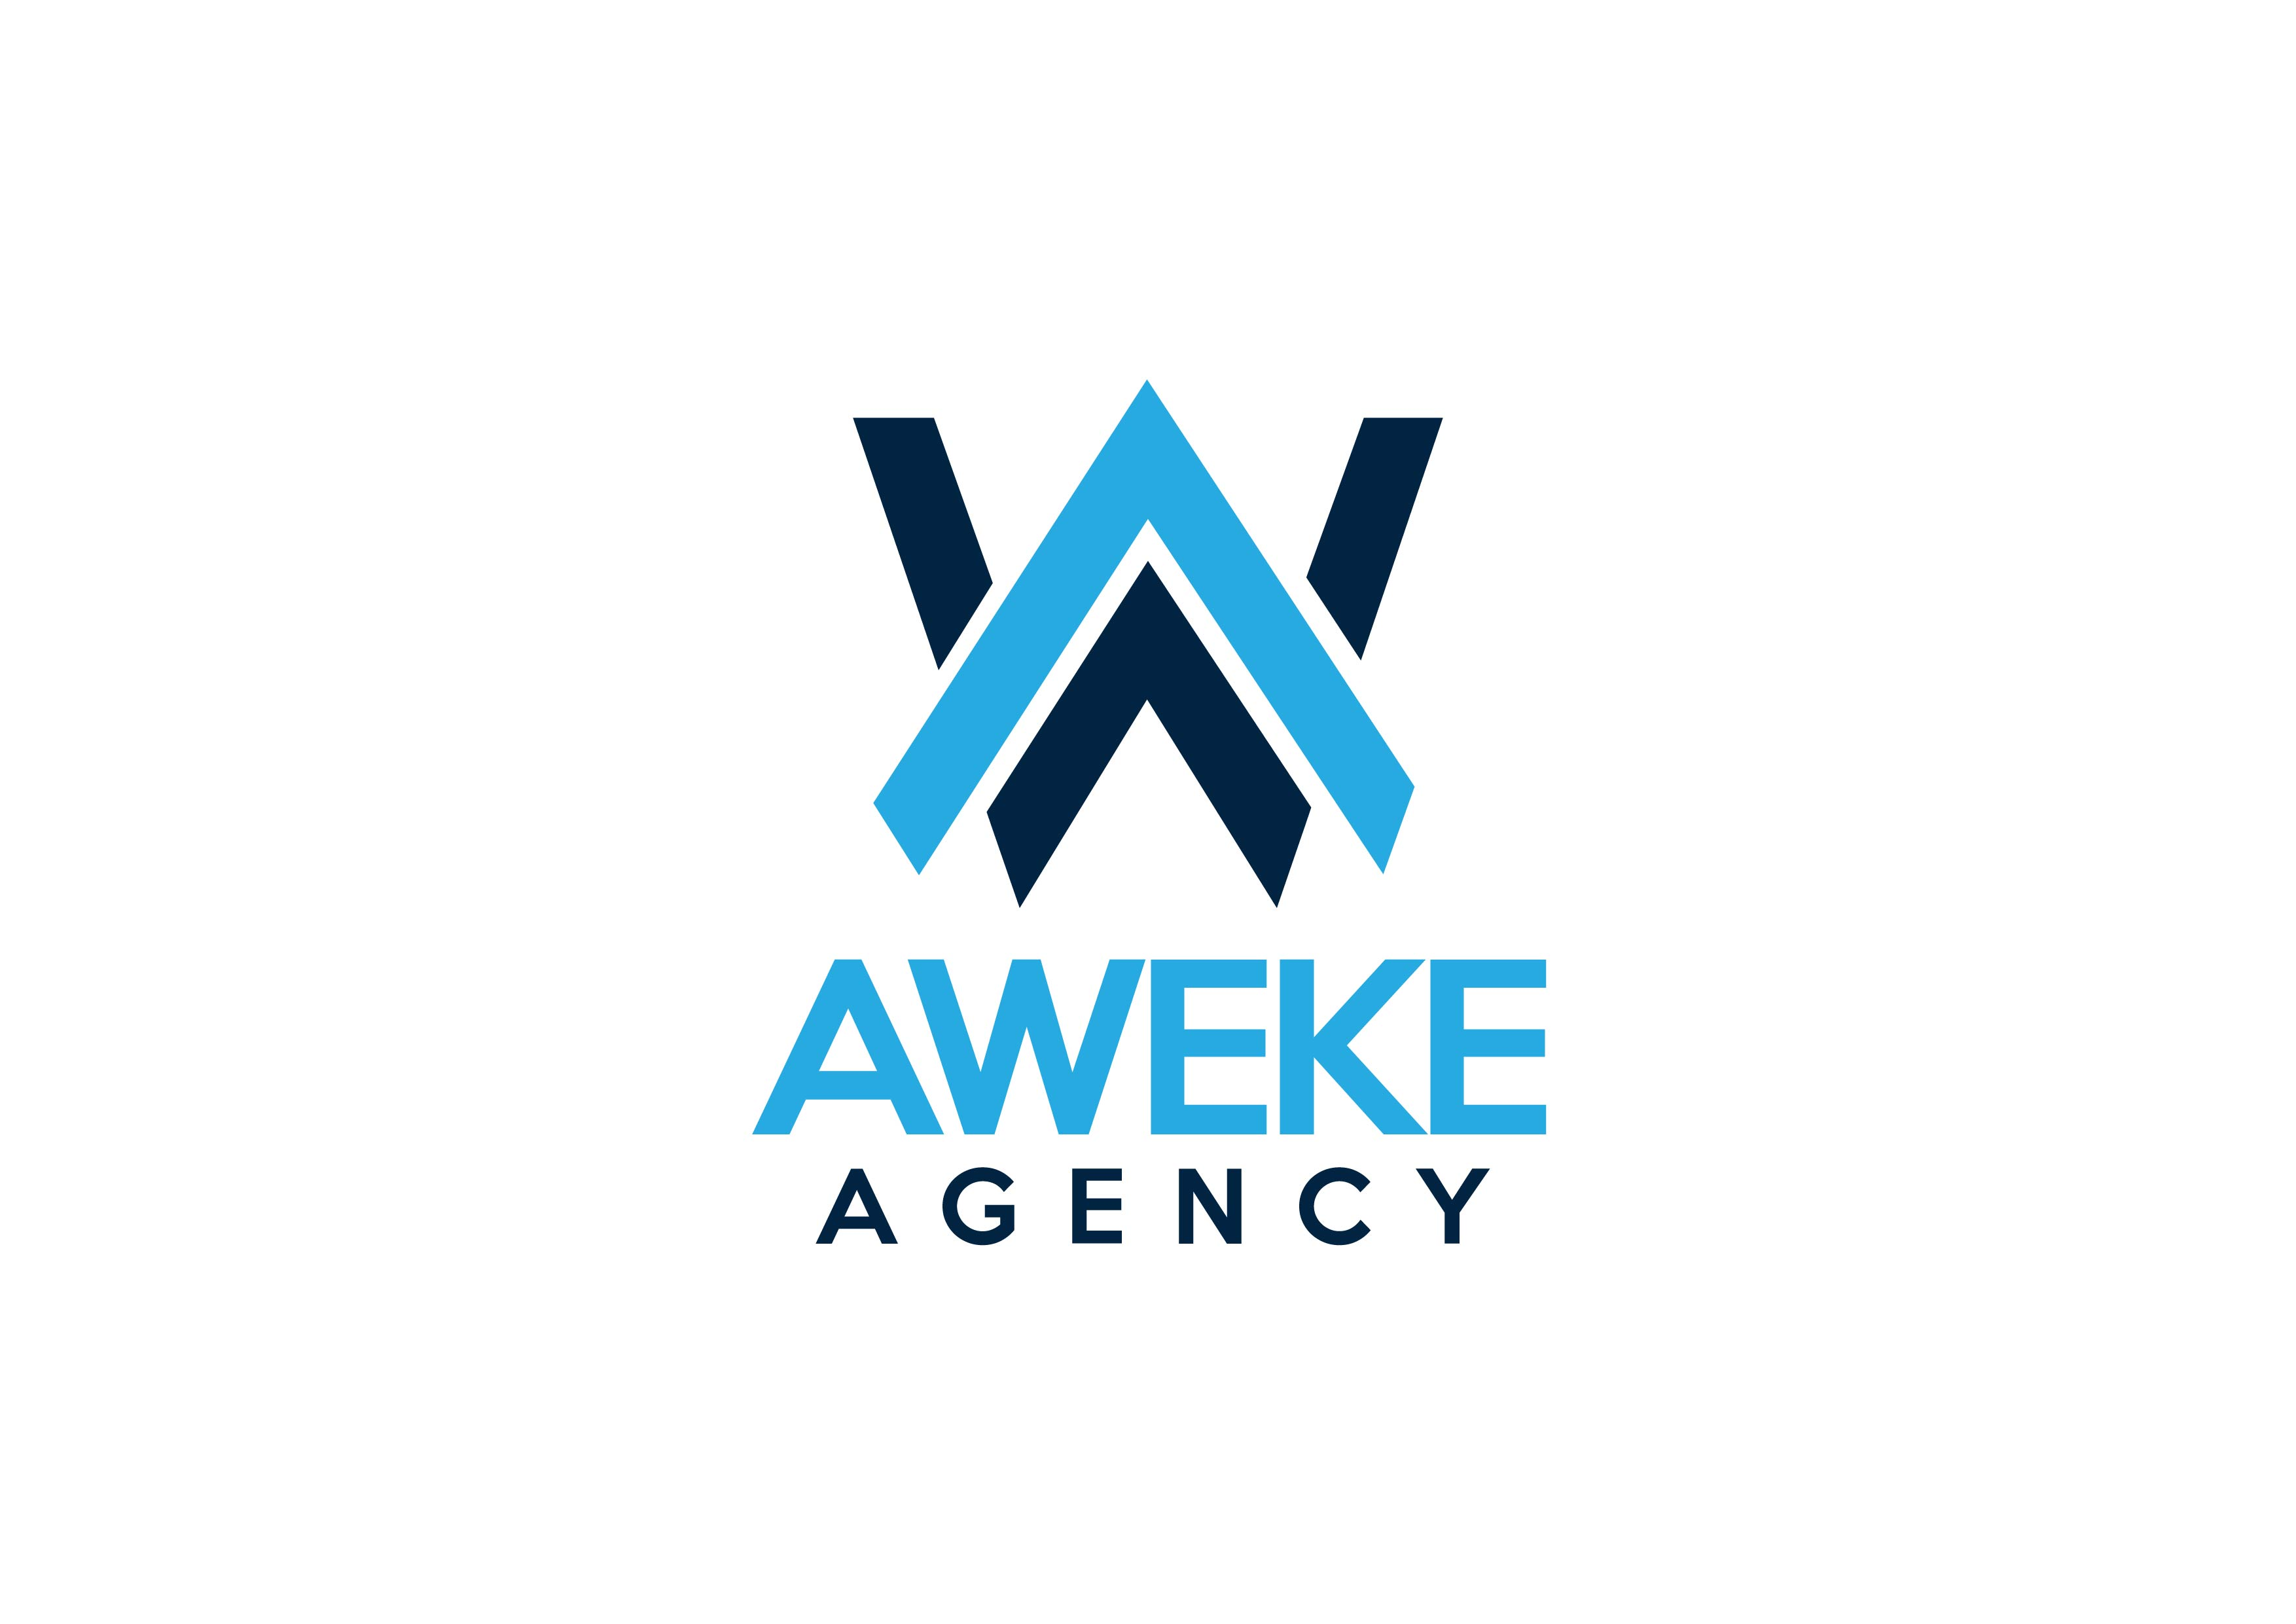 AWEKE Agency